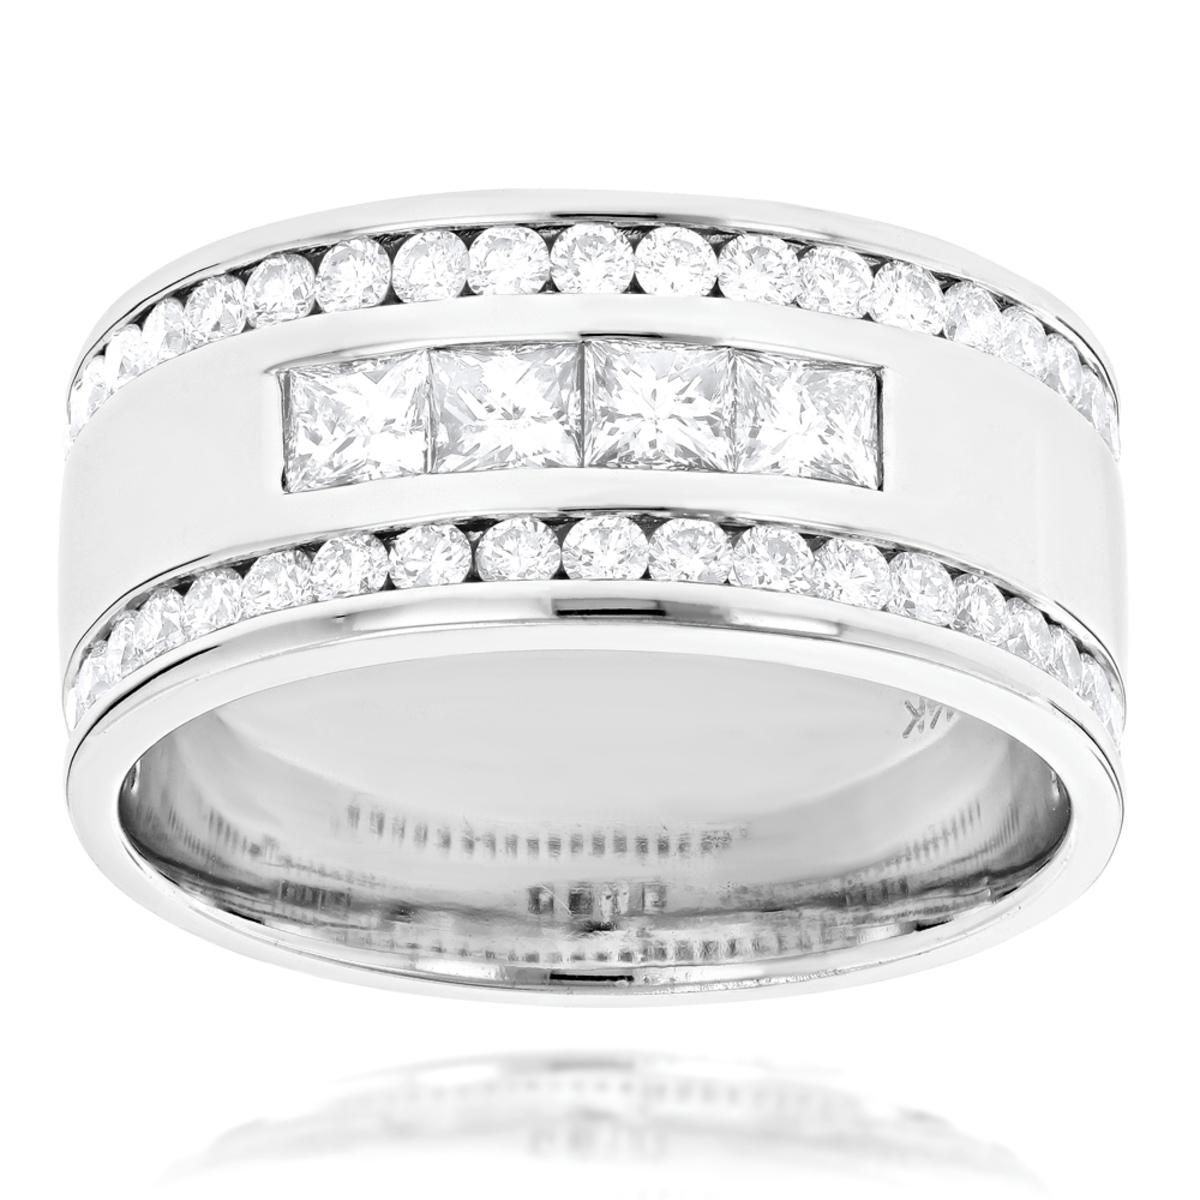 14K Gold Princess Round Diamond Mens Ring Comfort Fit Diamond Band 2.15ct